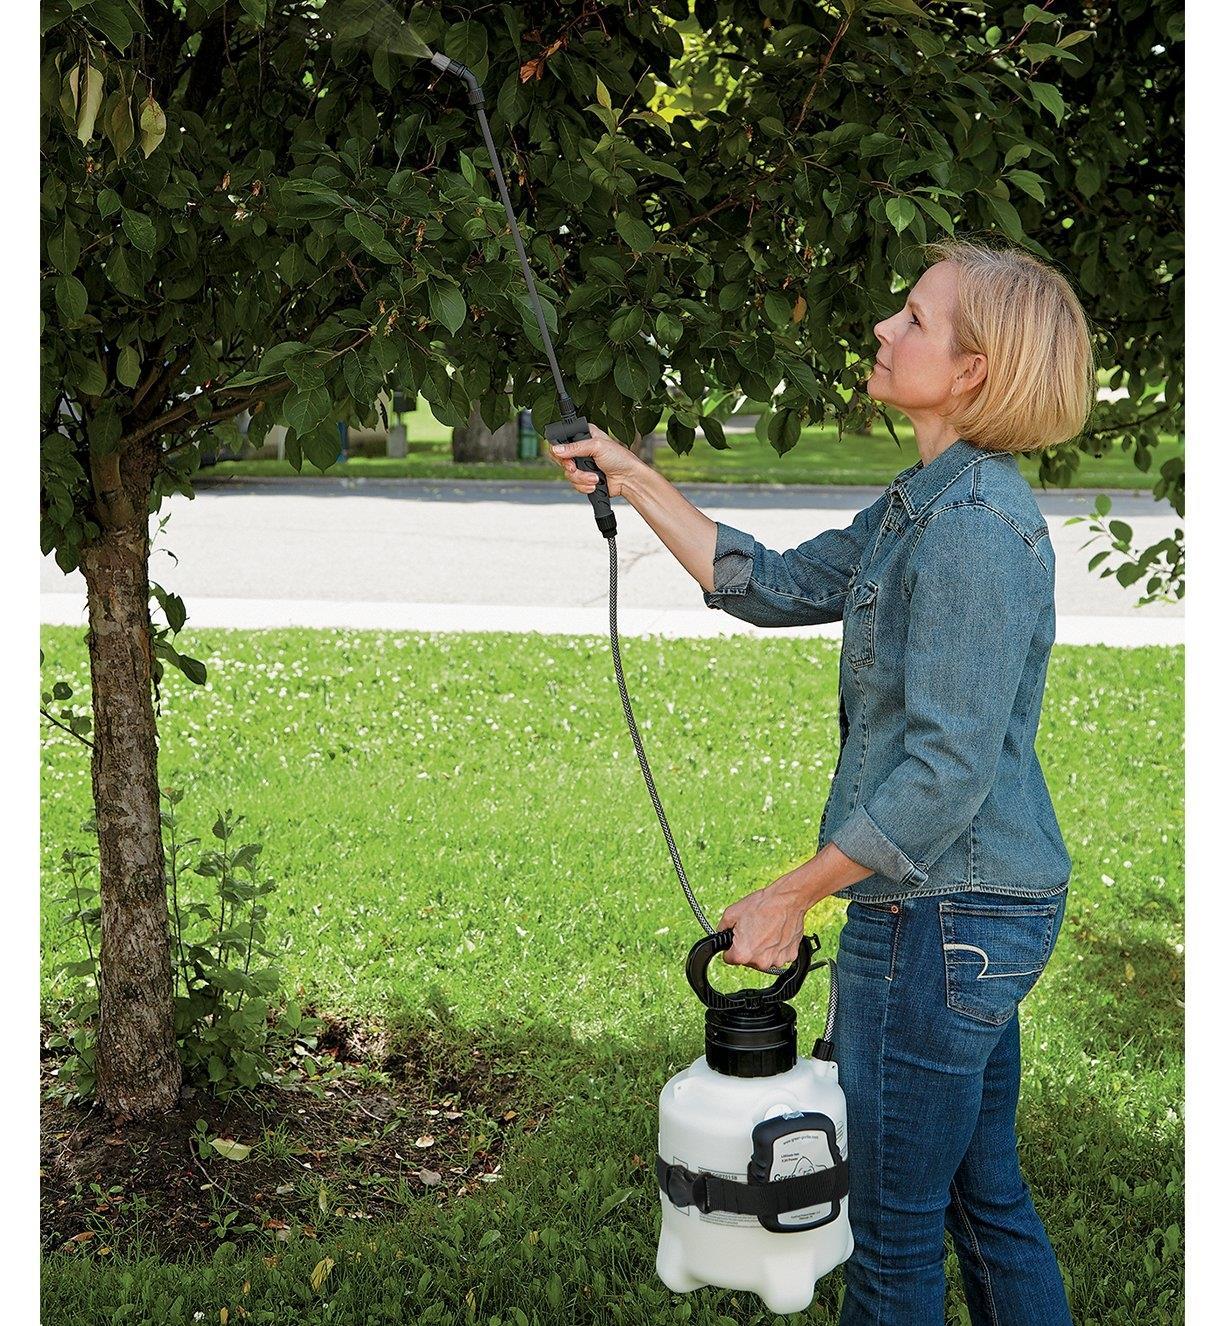 A woman sprays a tree using the Garden Sprayer